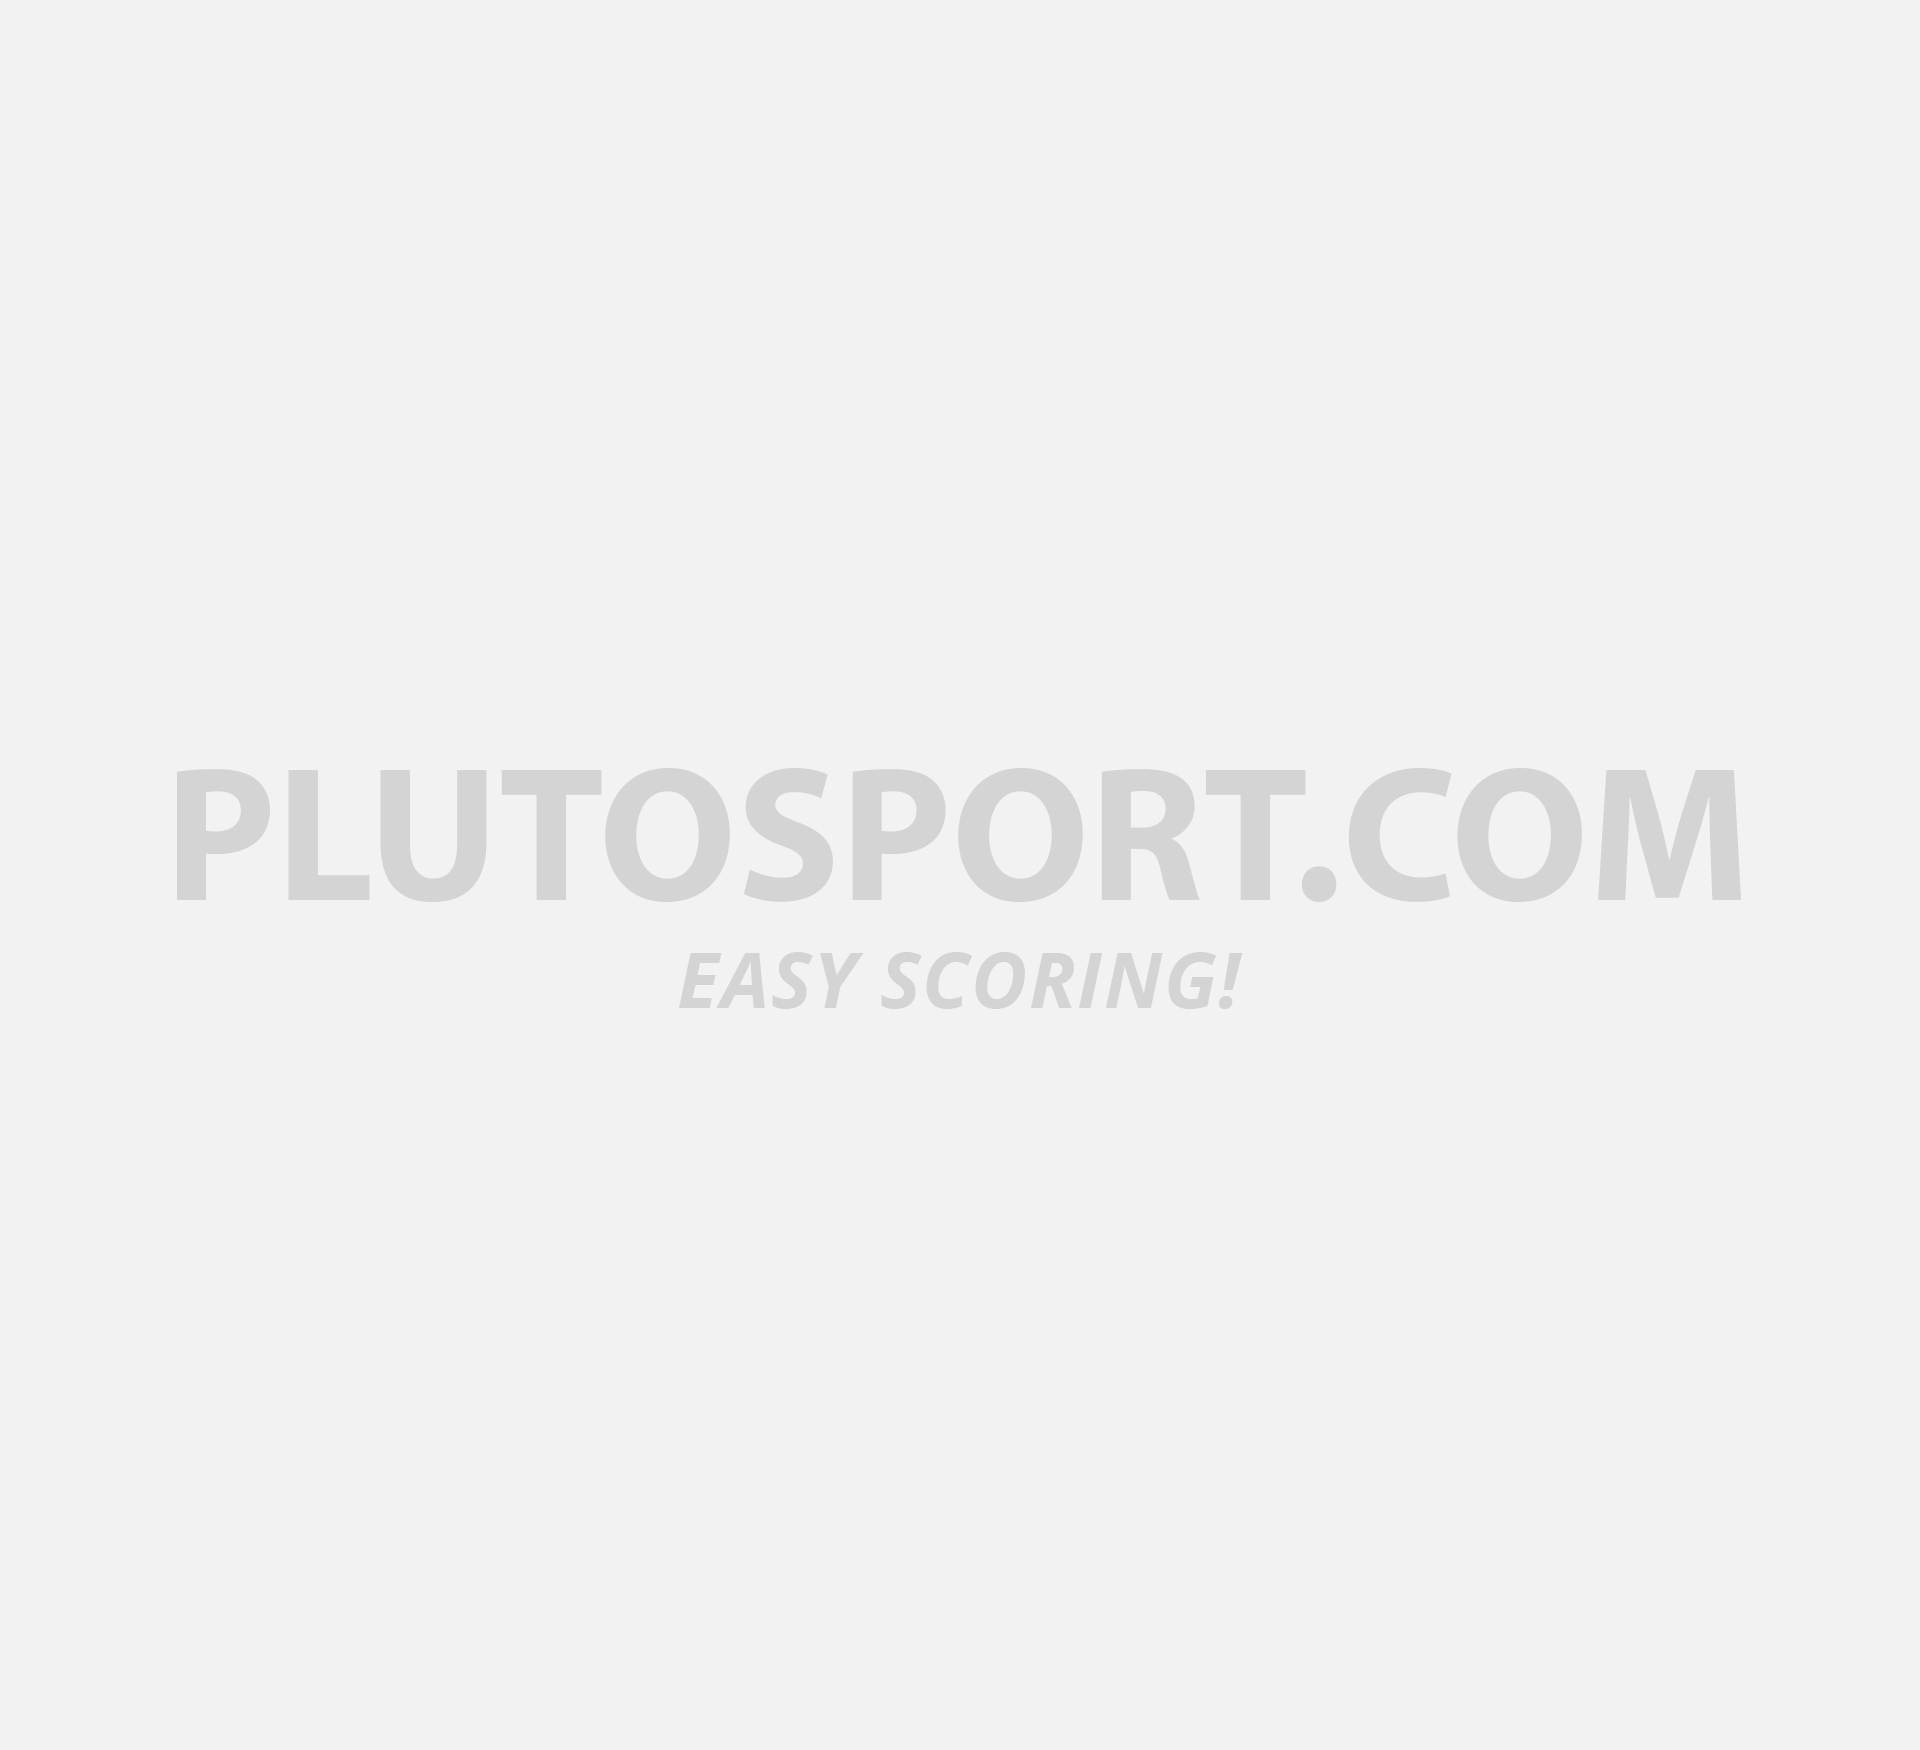 nike quest 2 review junior off 56% - www.siteworxtn.com